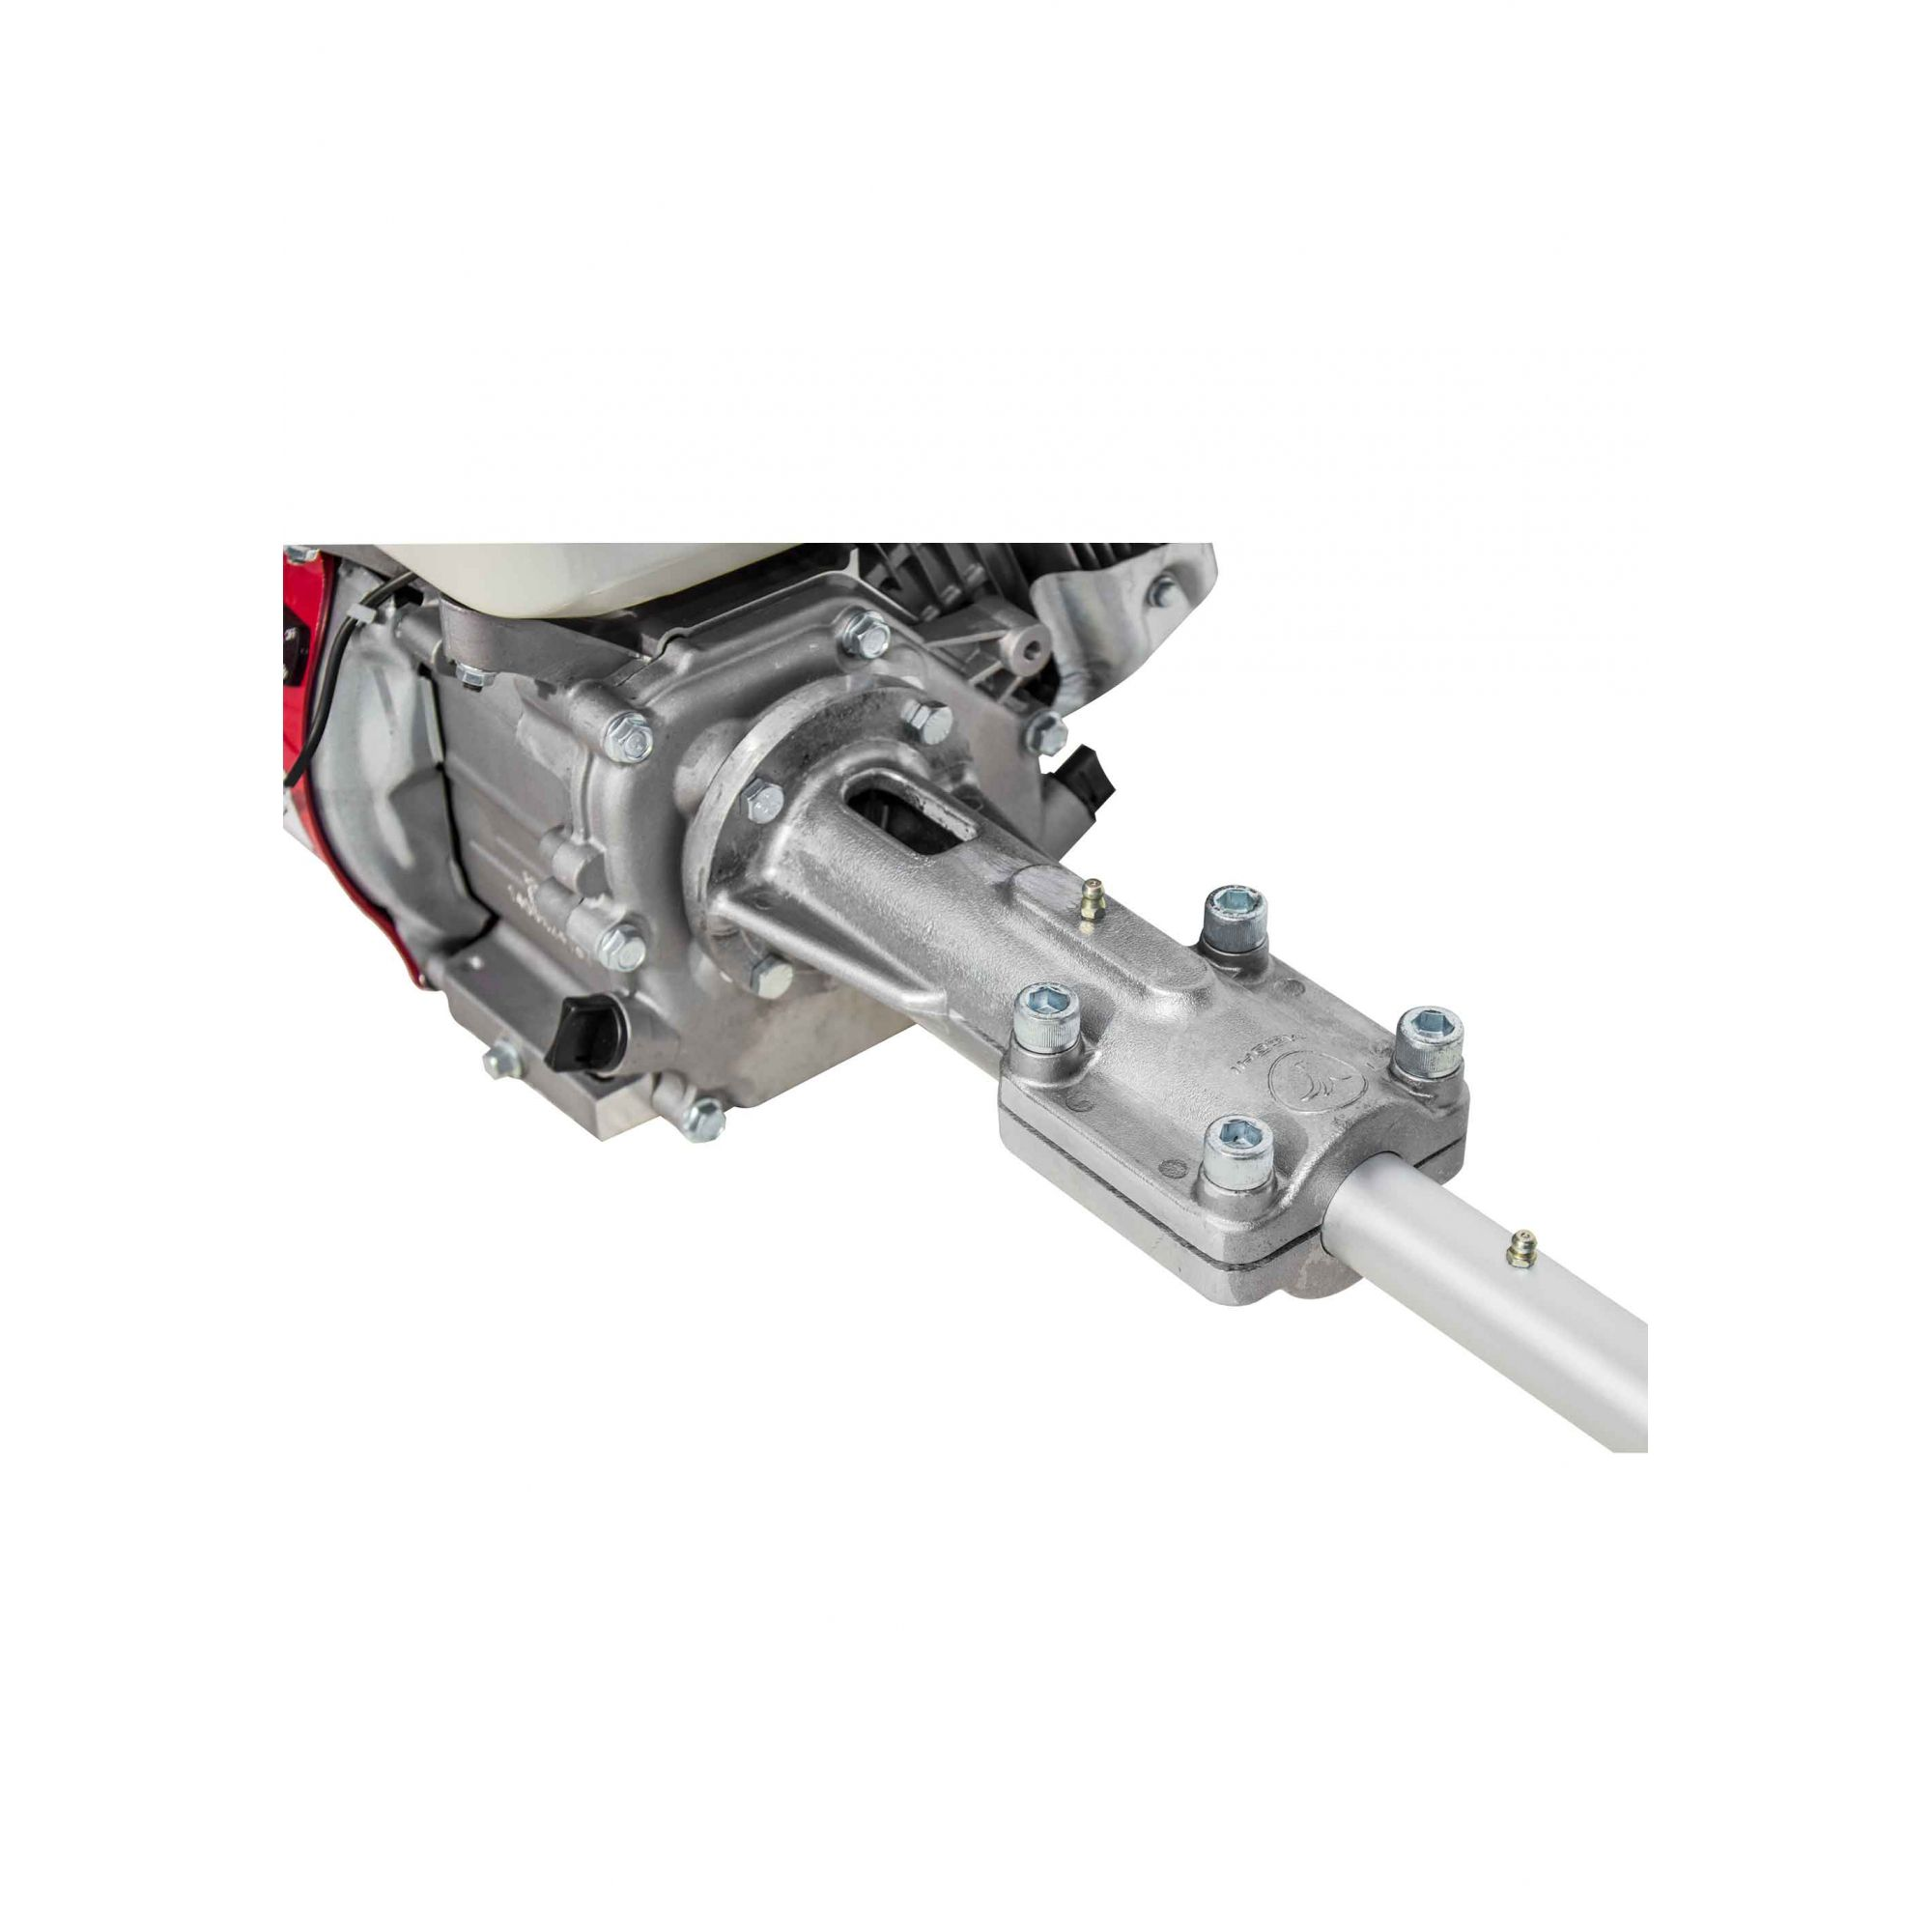 Kit Motor De Centro Barco Bote 2,20mt P/ Motor 10 Die/13 Gas